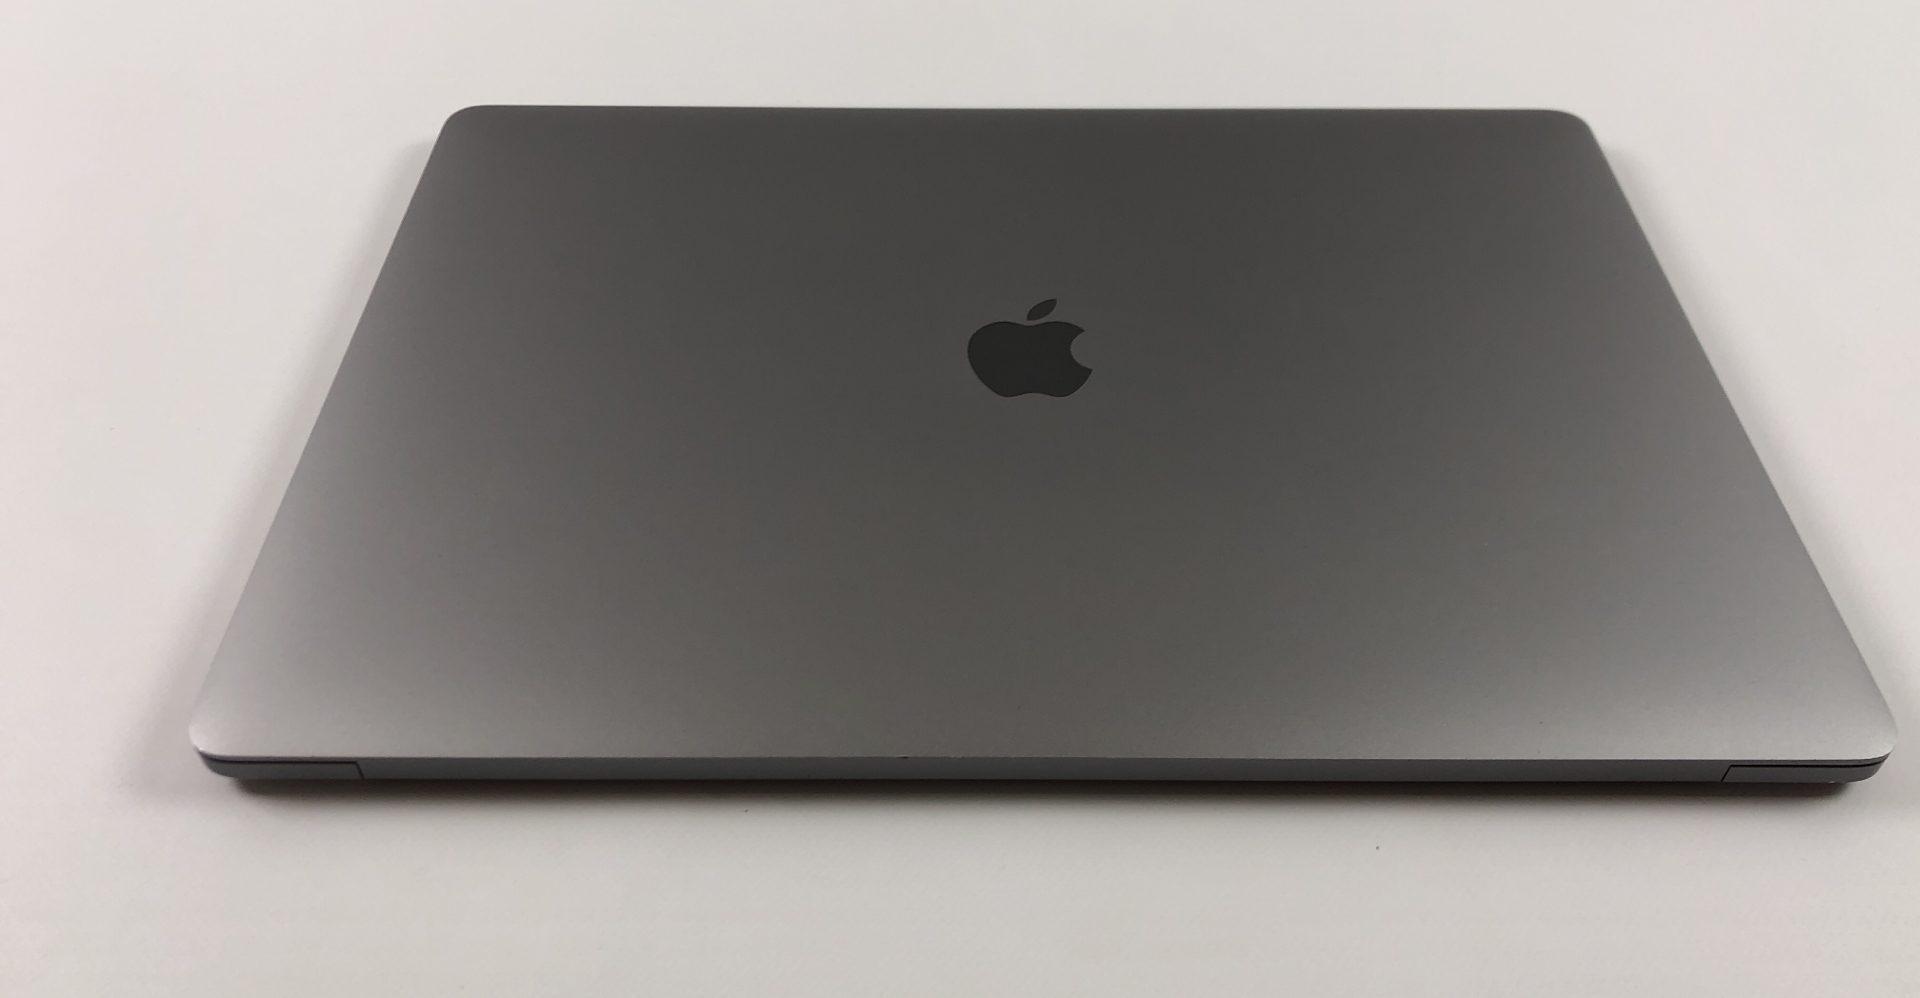 "MacBook Pro 15"" Touch Bar Late 2016 (Intel Quad-Core i7 2.7 GHz 16 GB RAM 512 GB SSD), Space Gray, Intel Quad-Core i7 2.7 GHz, 16 GB RAM, 512 GB SSD, Kuva 2"